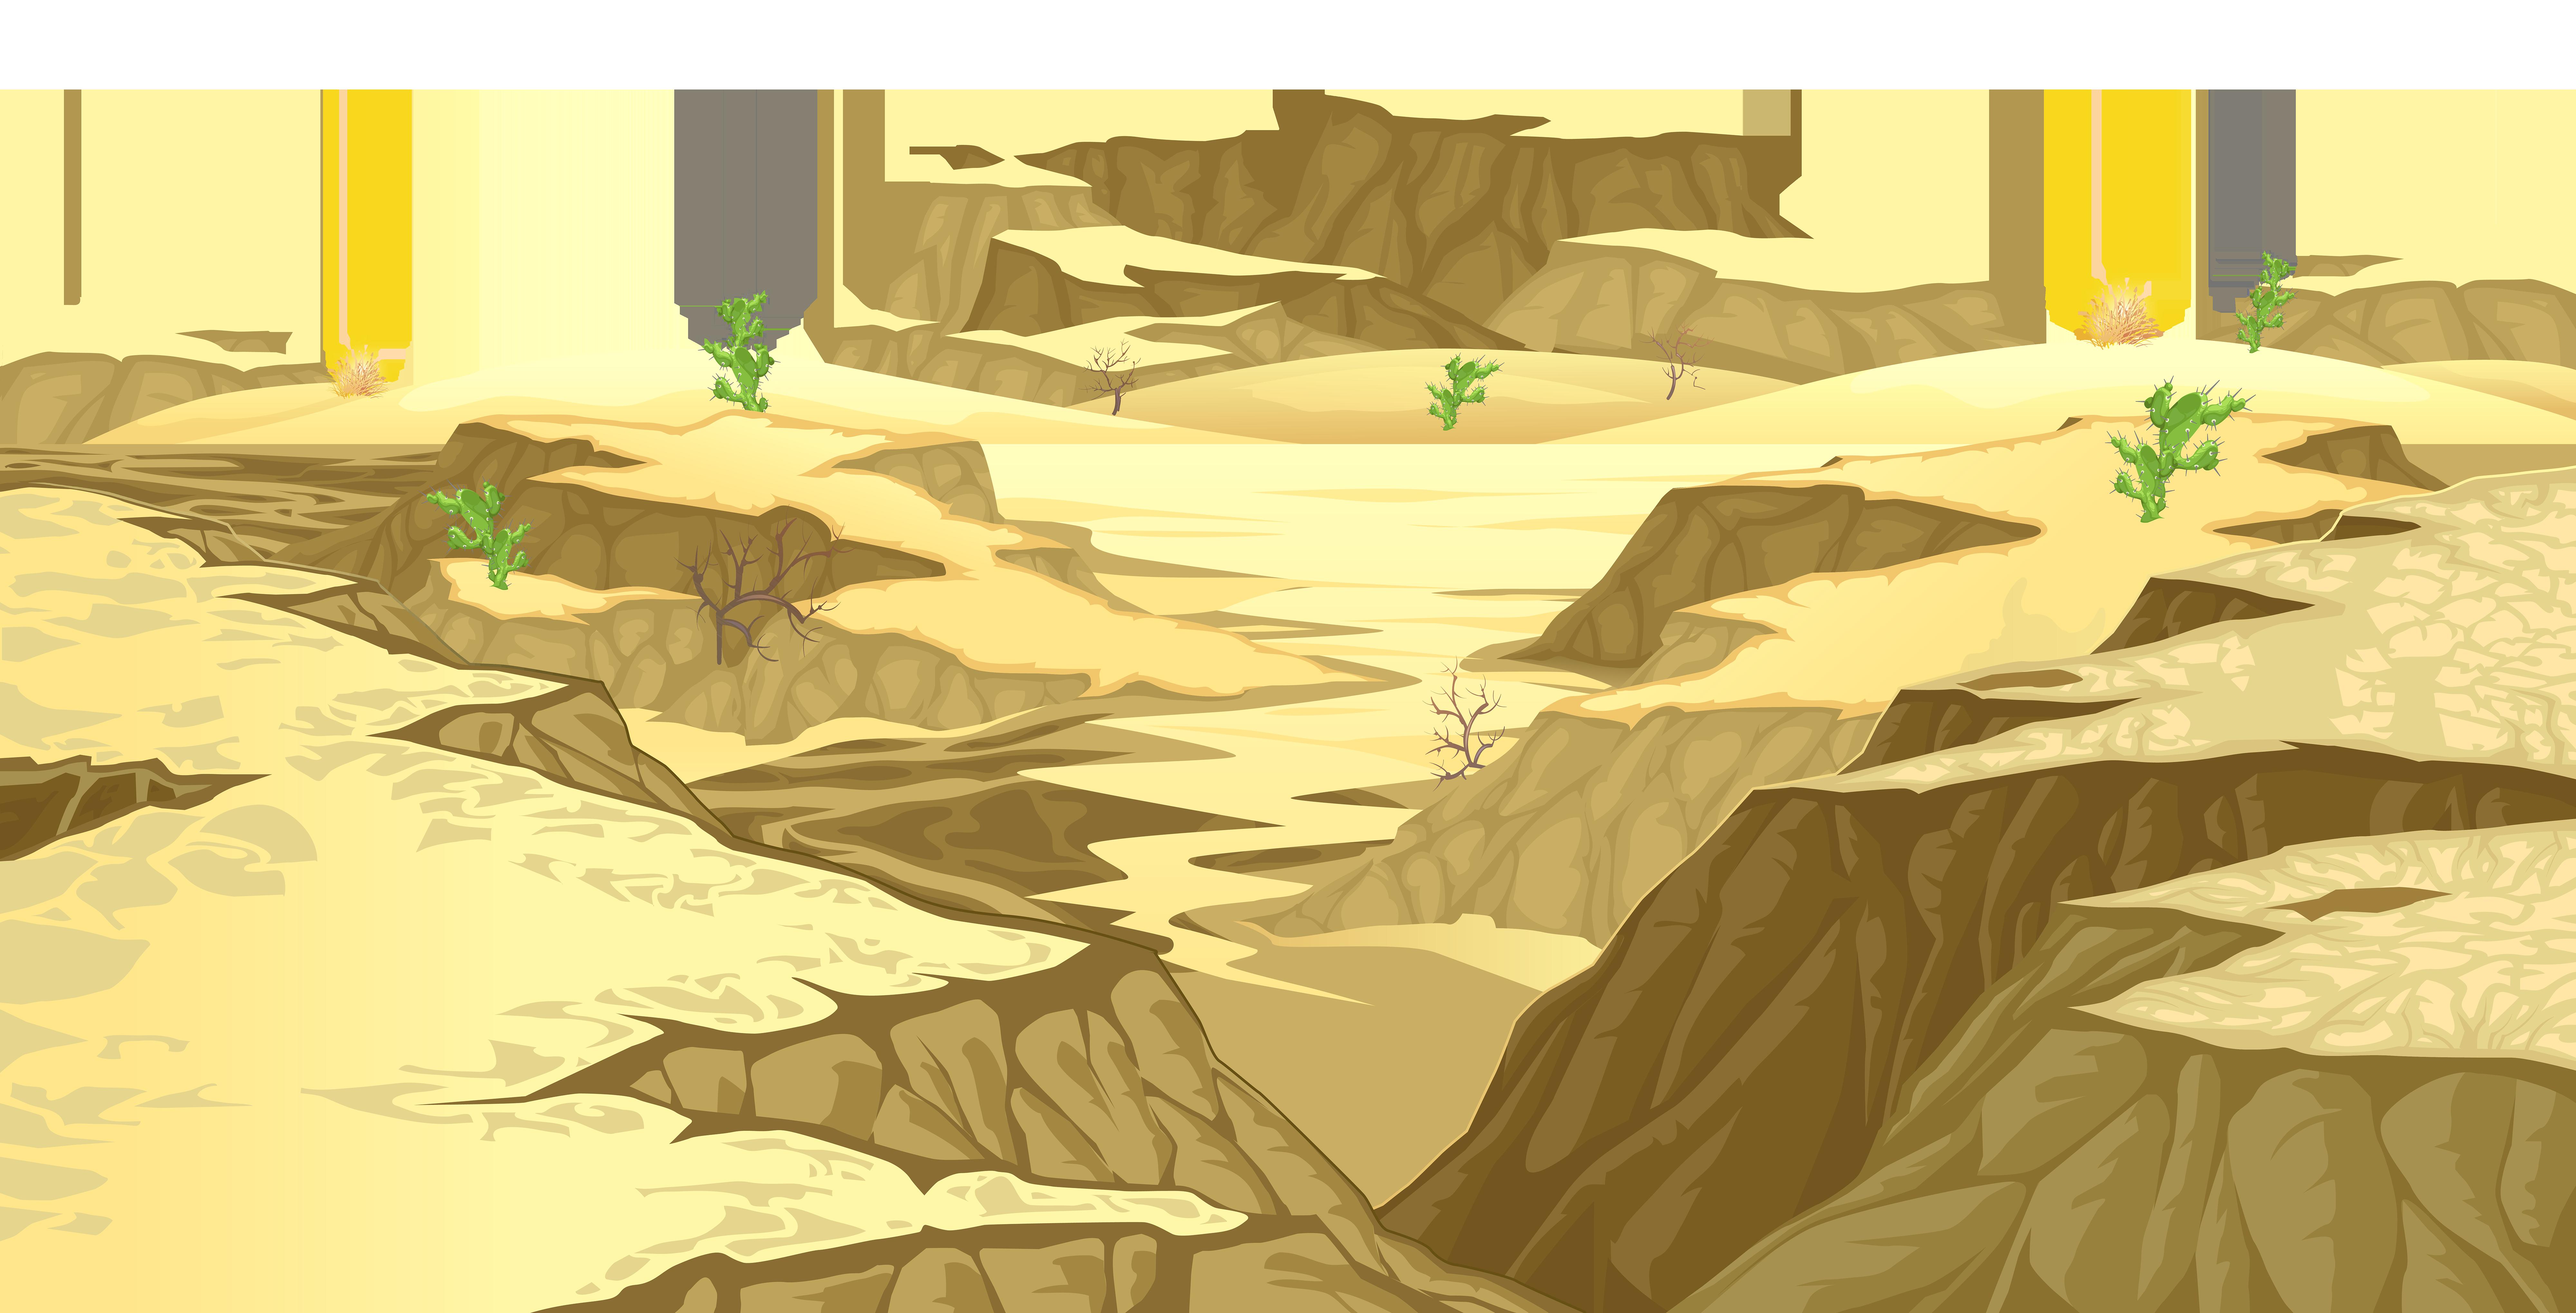 Desert clipart sponge cake. Ground cover transparent png